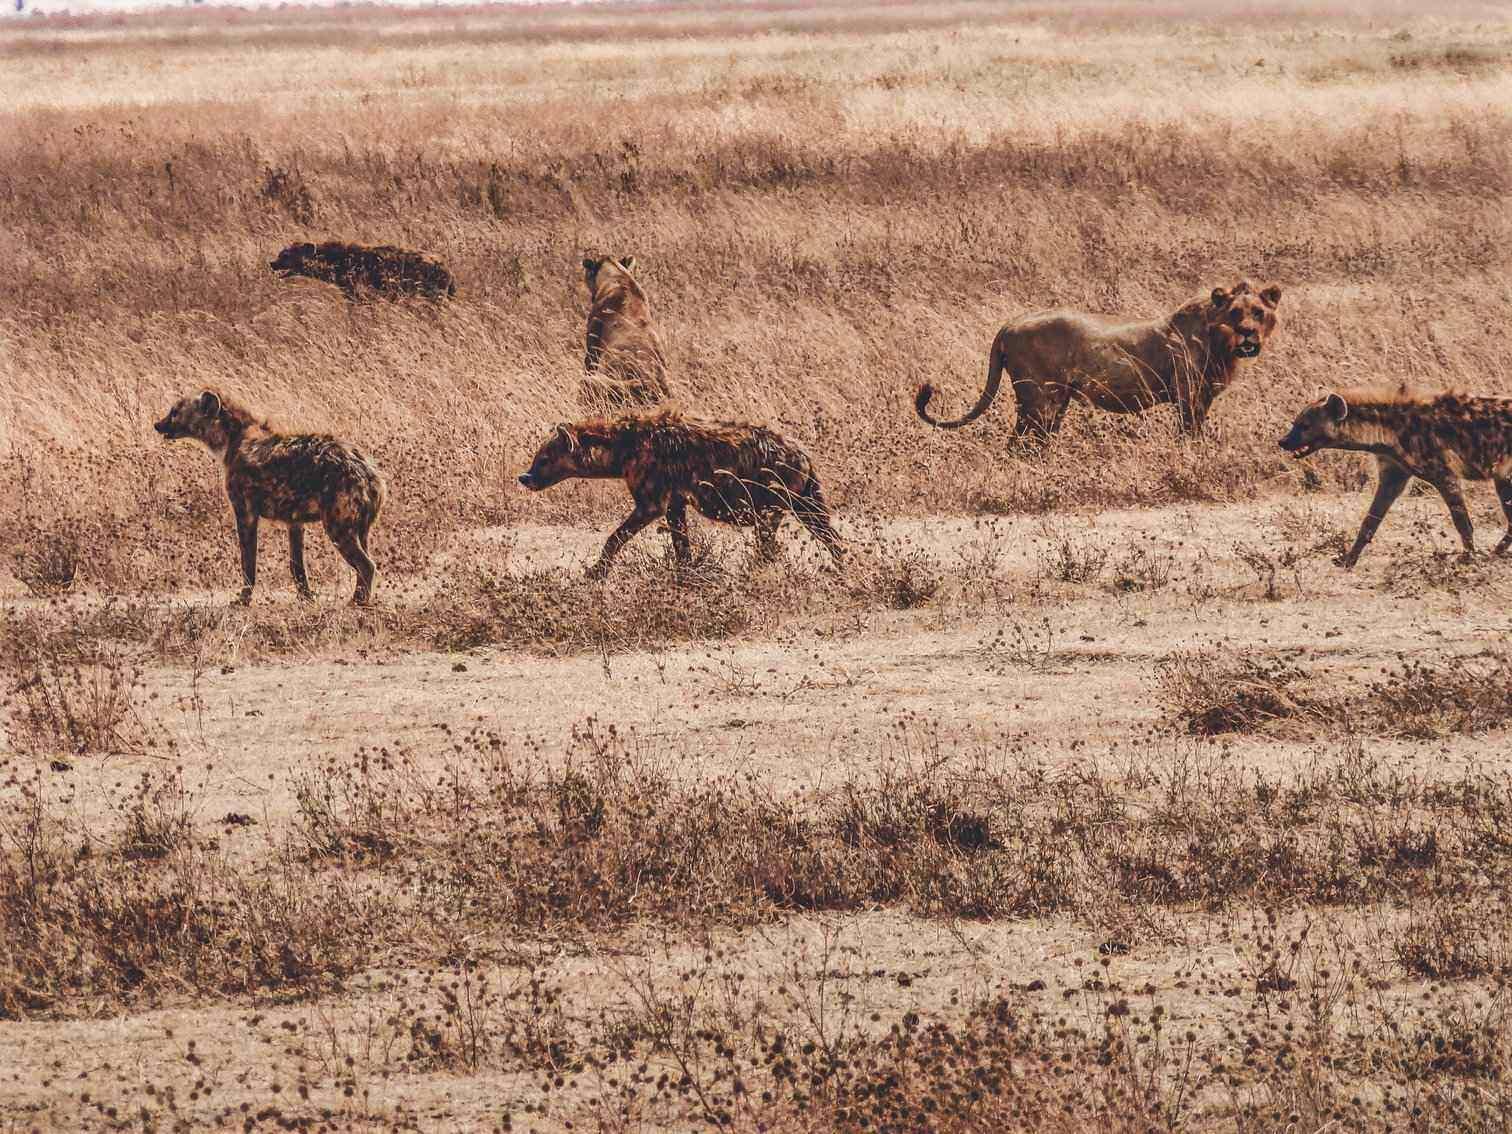 Ngoronoro Lions